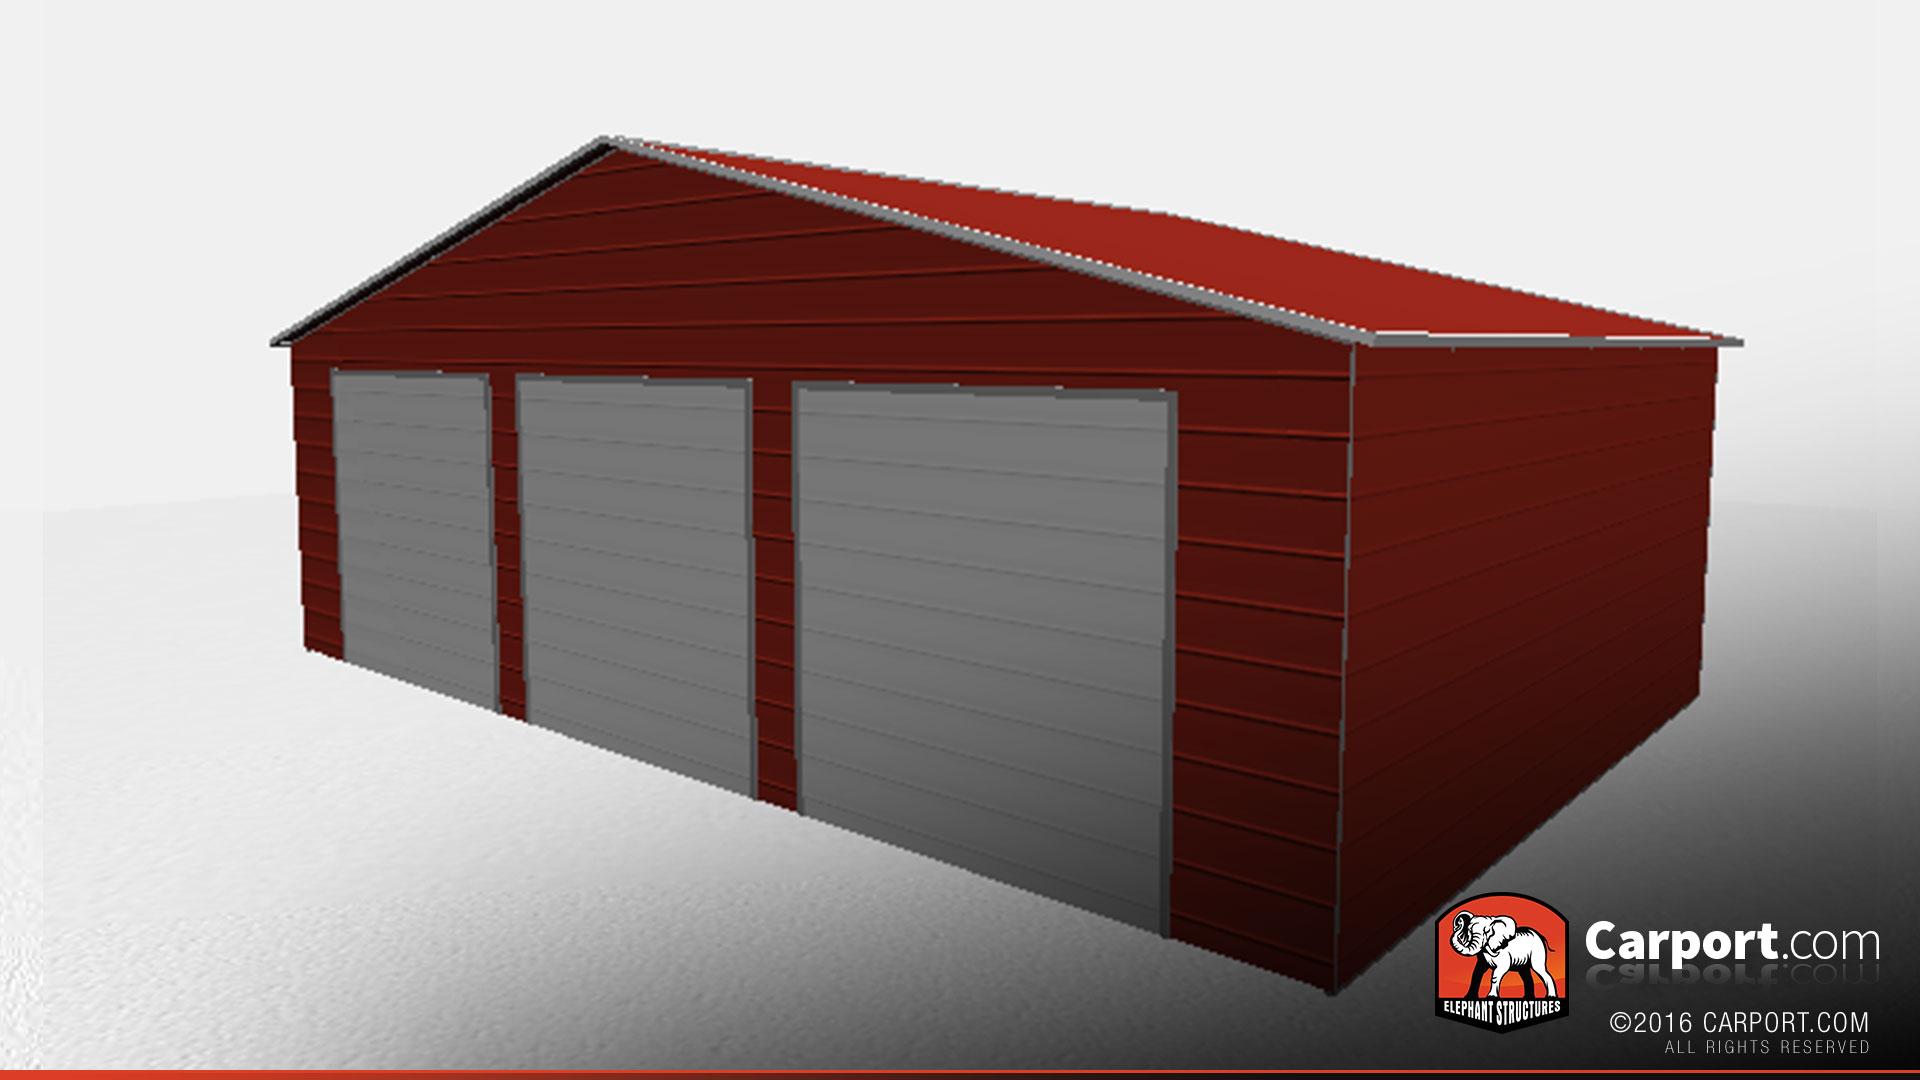 storage building & Three Car Garage Storage Building with Vertical Roof | Carport.com